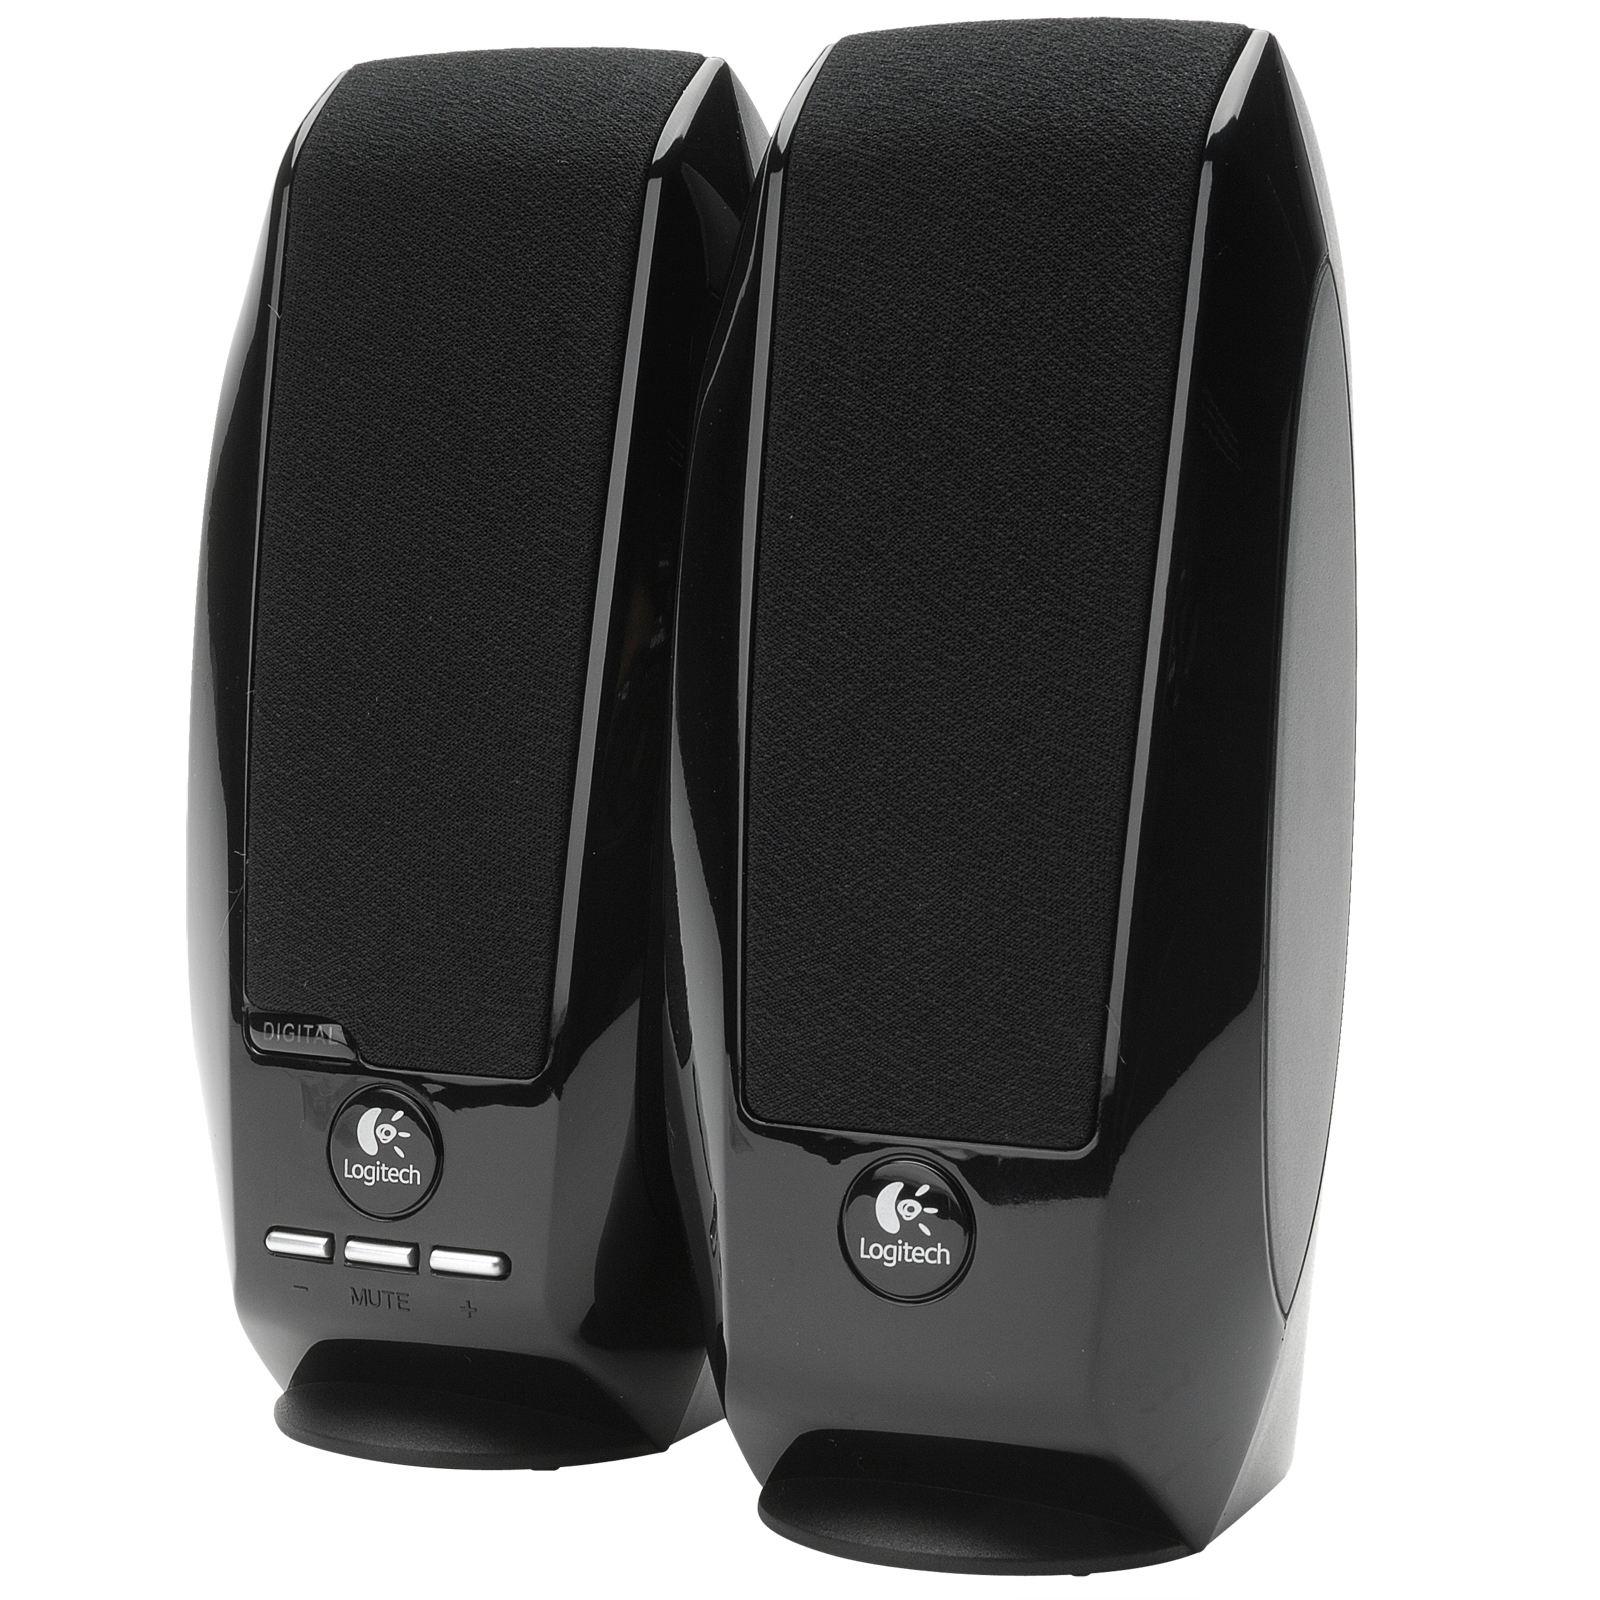 Logitech 980 000012 s120 2 piece black desktop computer speaker set - Logitech S150 Usb Speakers With Digital Sound